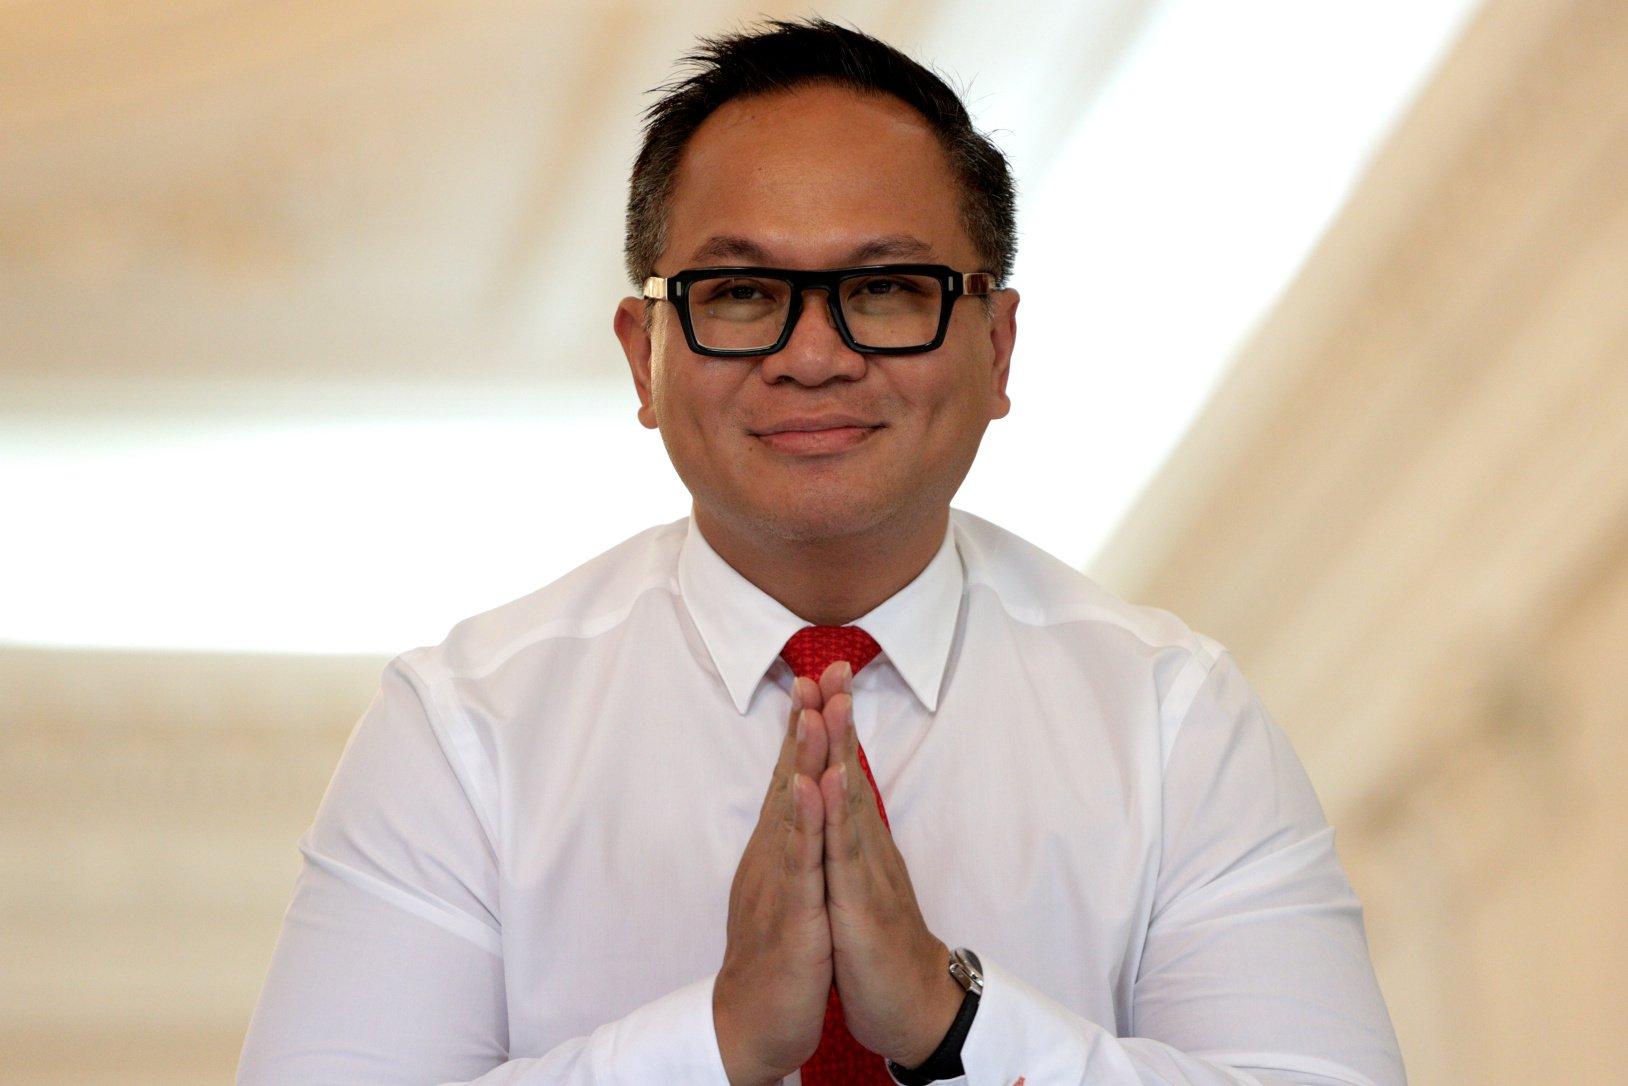 Wakil Menteri BUMN Kartika Wirjoatmodjo, usai bertemu Presiden Joko Widodo di Kompleks Istana Kepresidenan, Jakarta, Jumat (25/10/2019). Kartika yang menjabat Direktur Bank Mandiri ini, memiliki karier yang cemerlang di sektor keuangan. Kartika pernah menuntaskan divestasi Bank Mutiara ketika ia menjabat sebagai kepala eksekutif Lembaga Penjamin Simpanan (LPS) pada 2014.